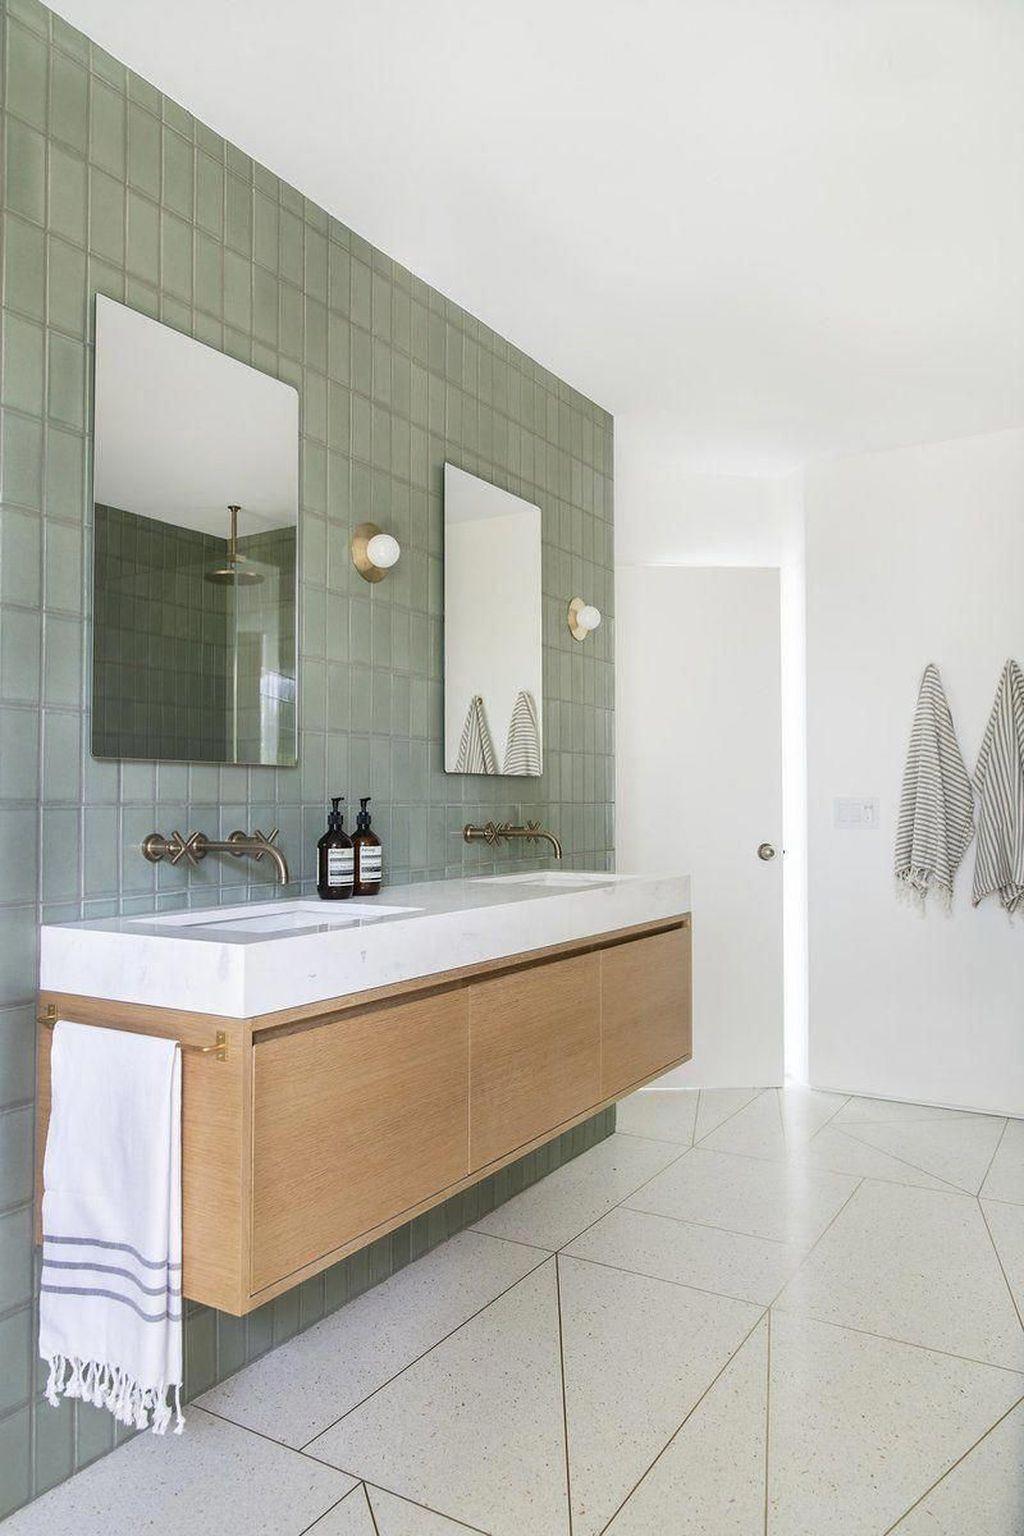 Admirable Rustic Modern Bathroom Design And Decor Ideas 18